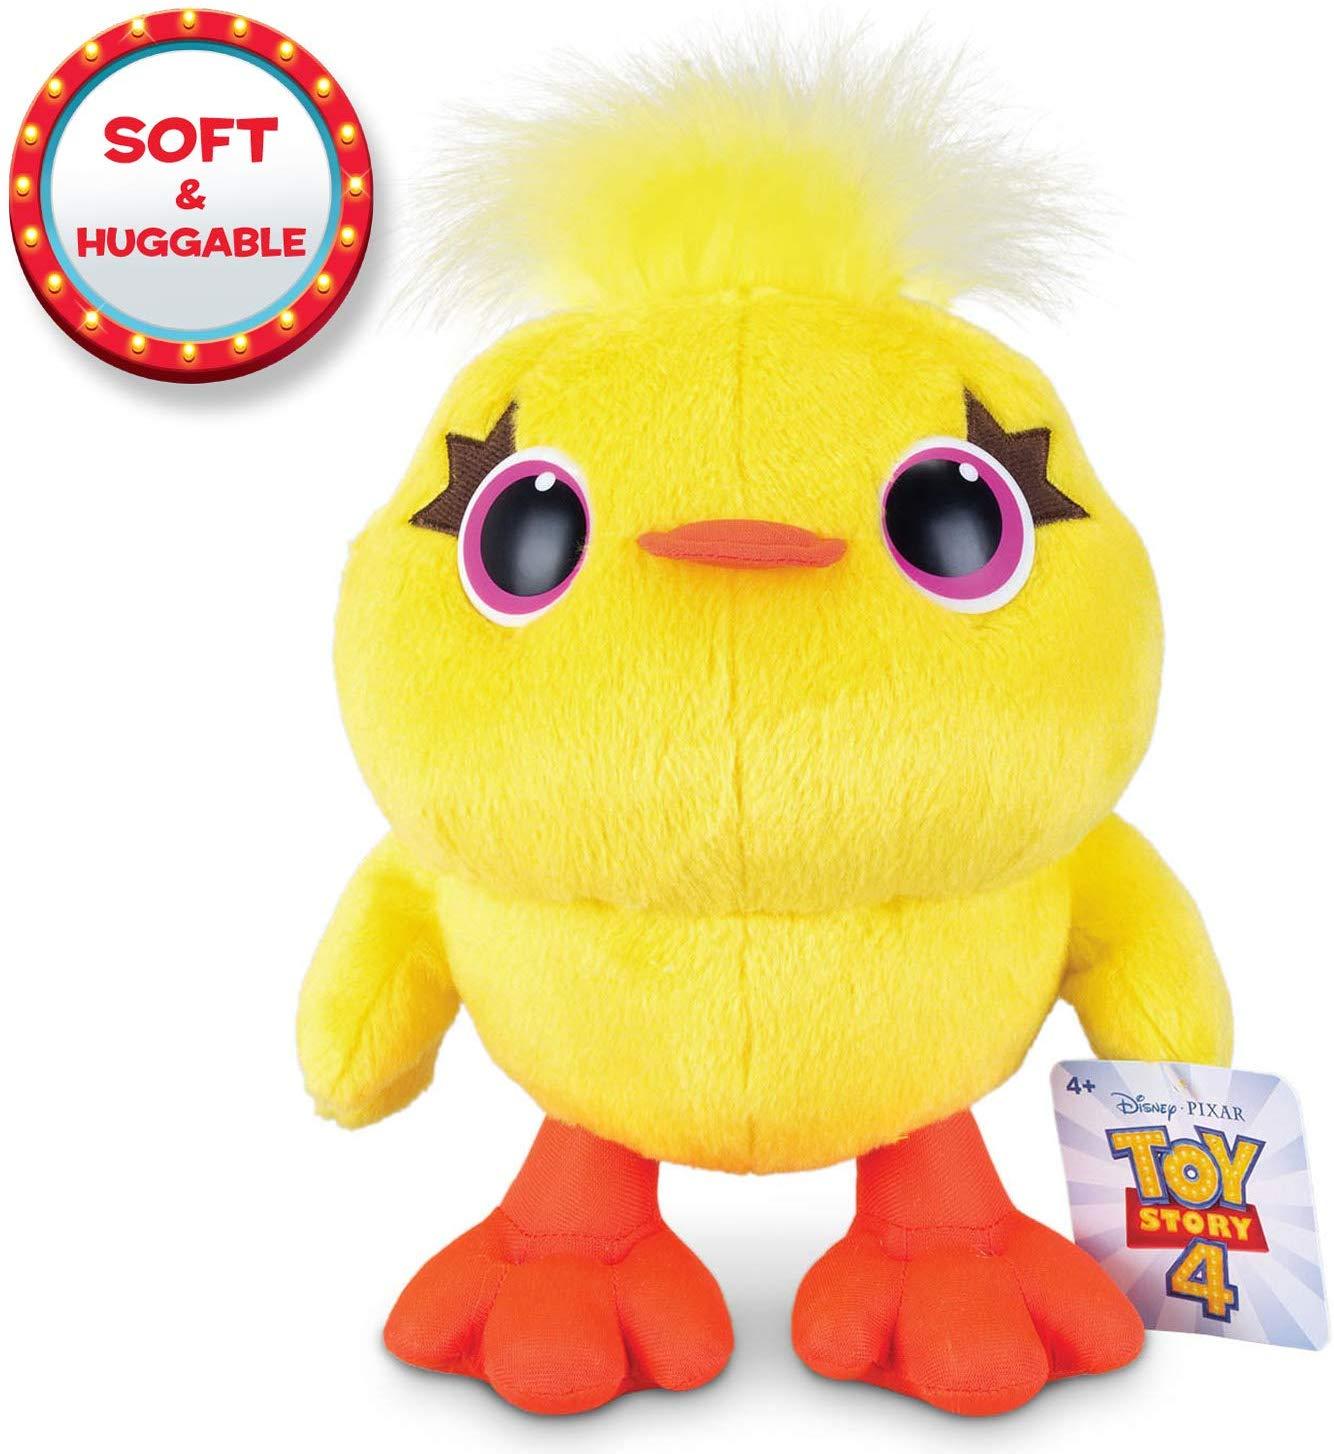 Toy Story Disney Pixar 4 Ducky Huggable Plush - $4.99 at Amazon [Limit 3]